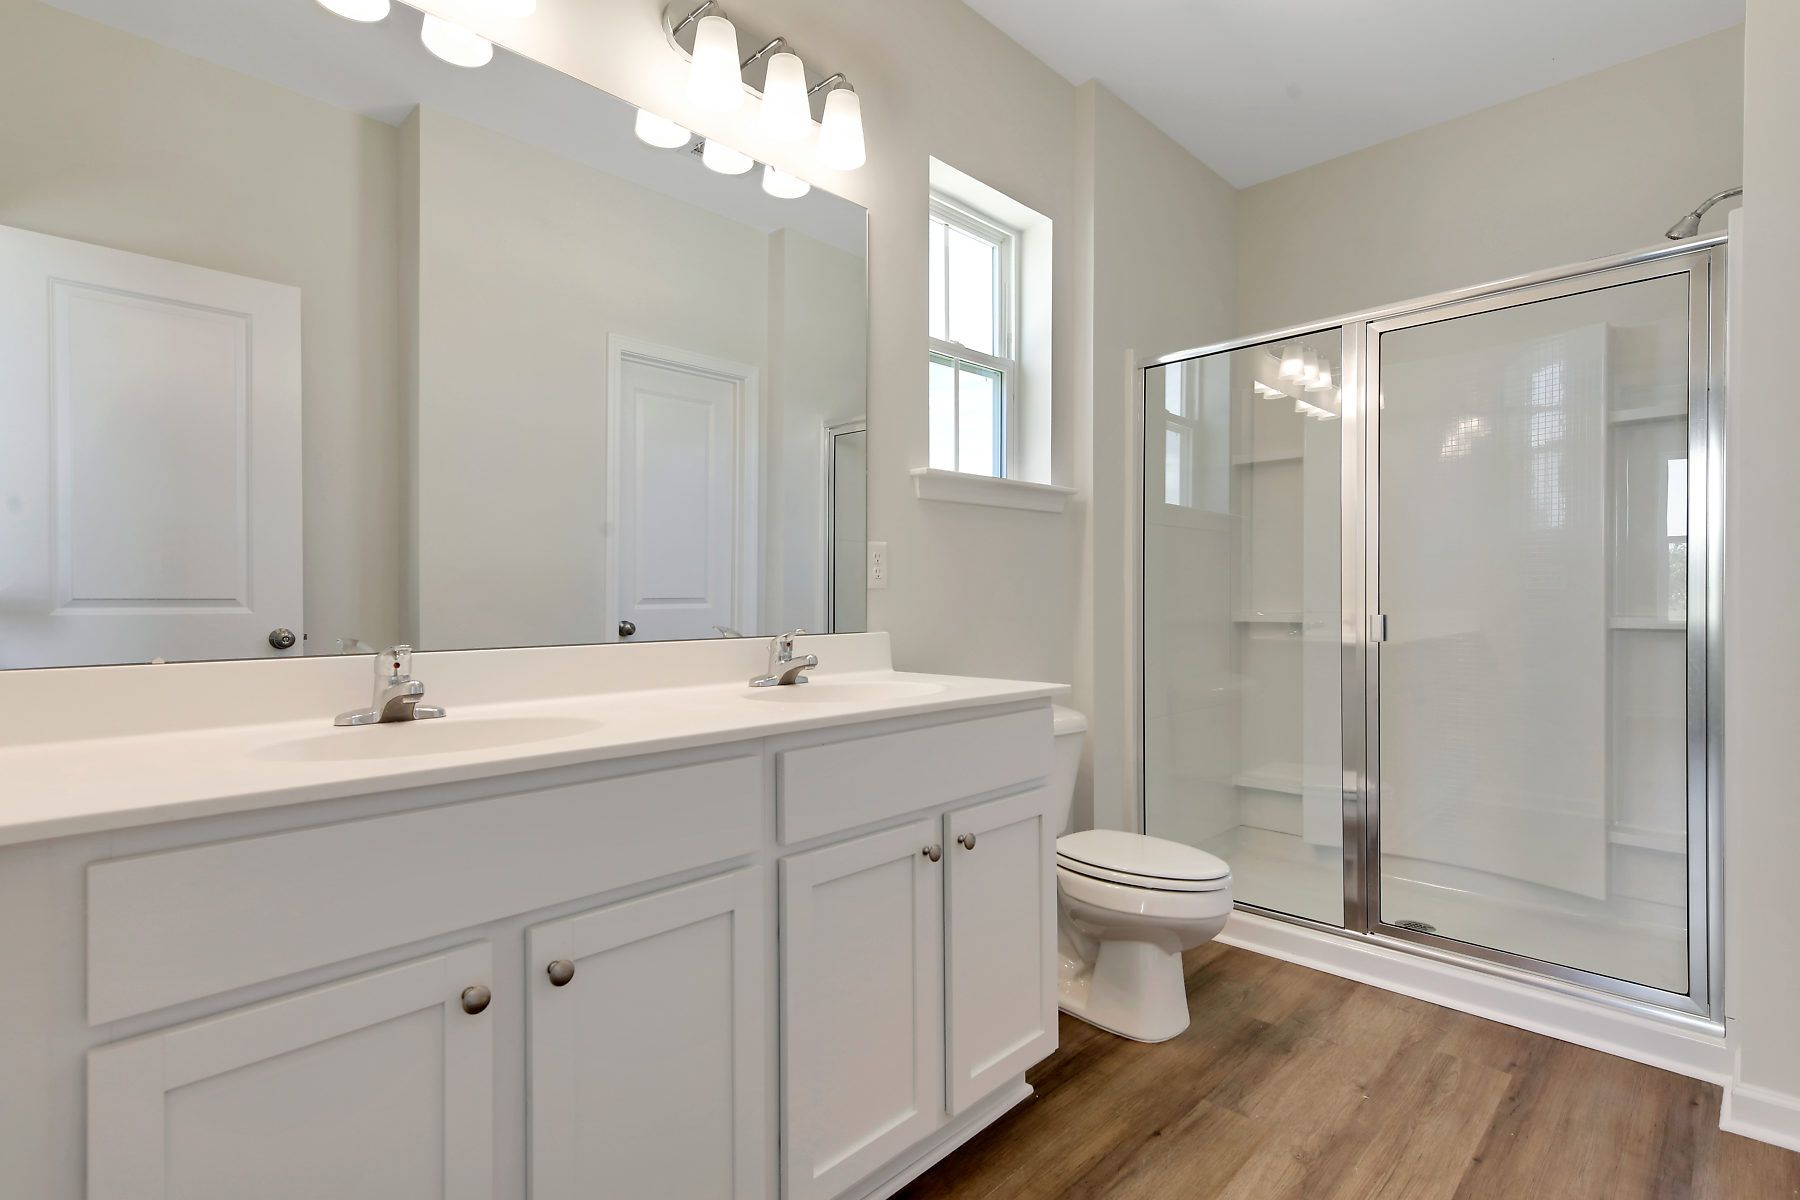 Bathroom featured in The Ridgeland By Village Park Homes in Hilton Head, SC